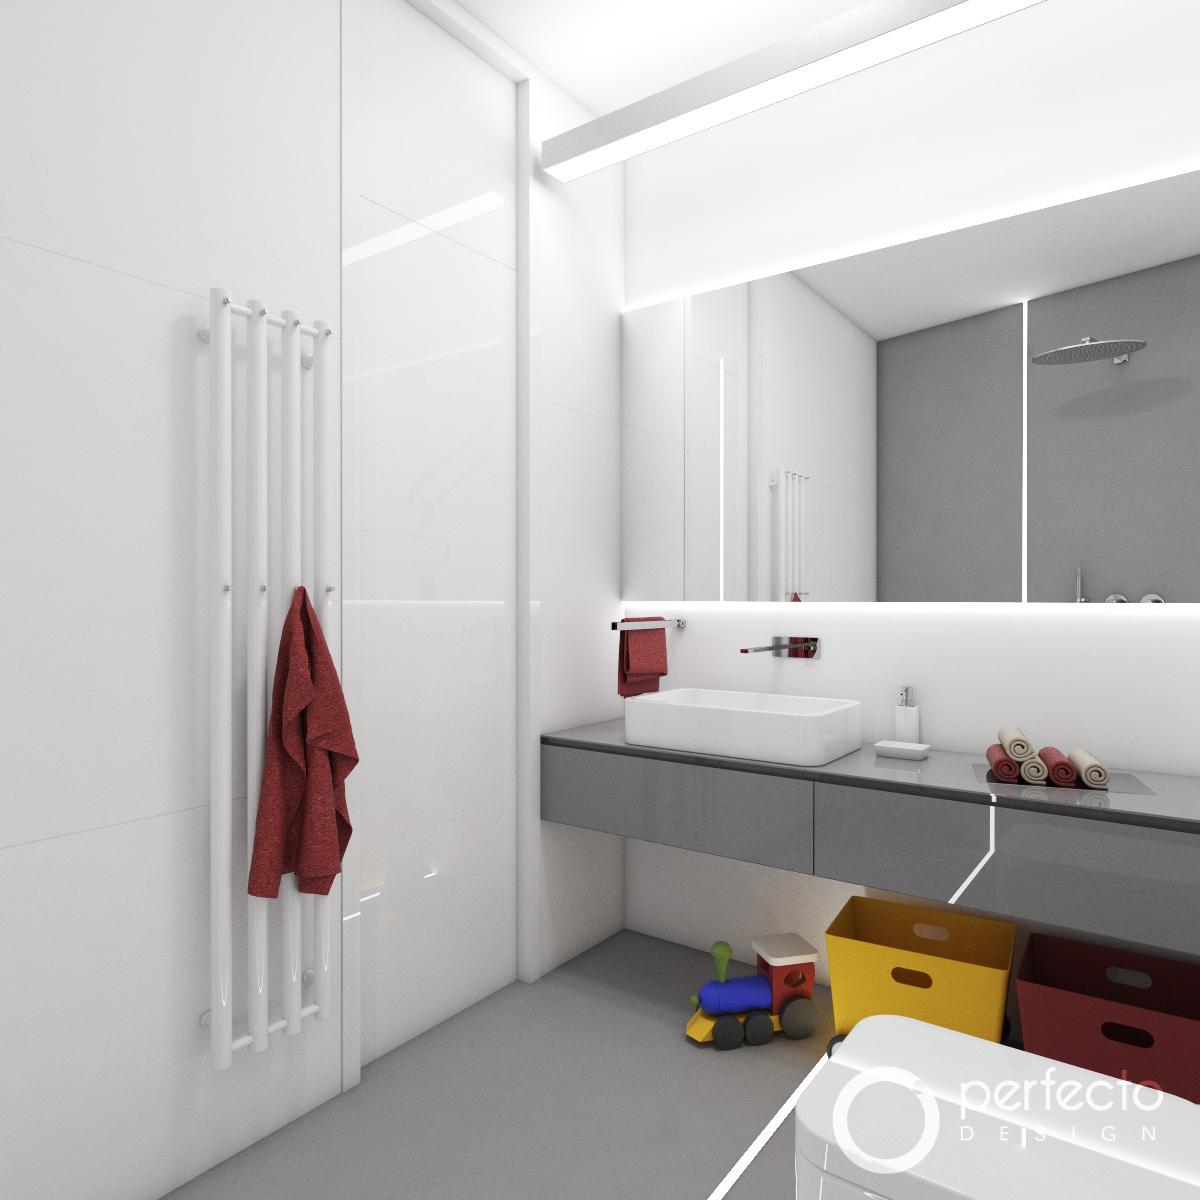 kinder-badezimmer rail | perfecto design, Badezimmer